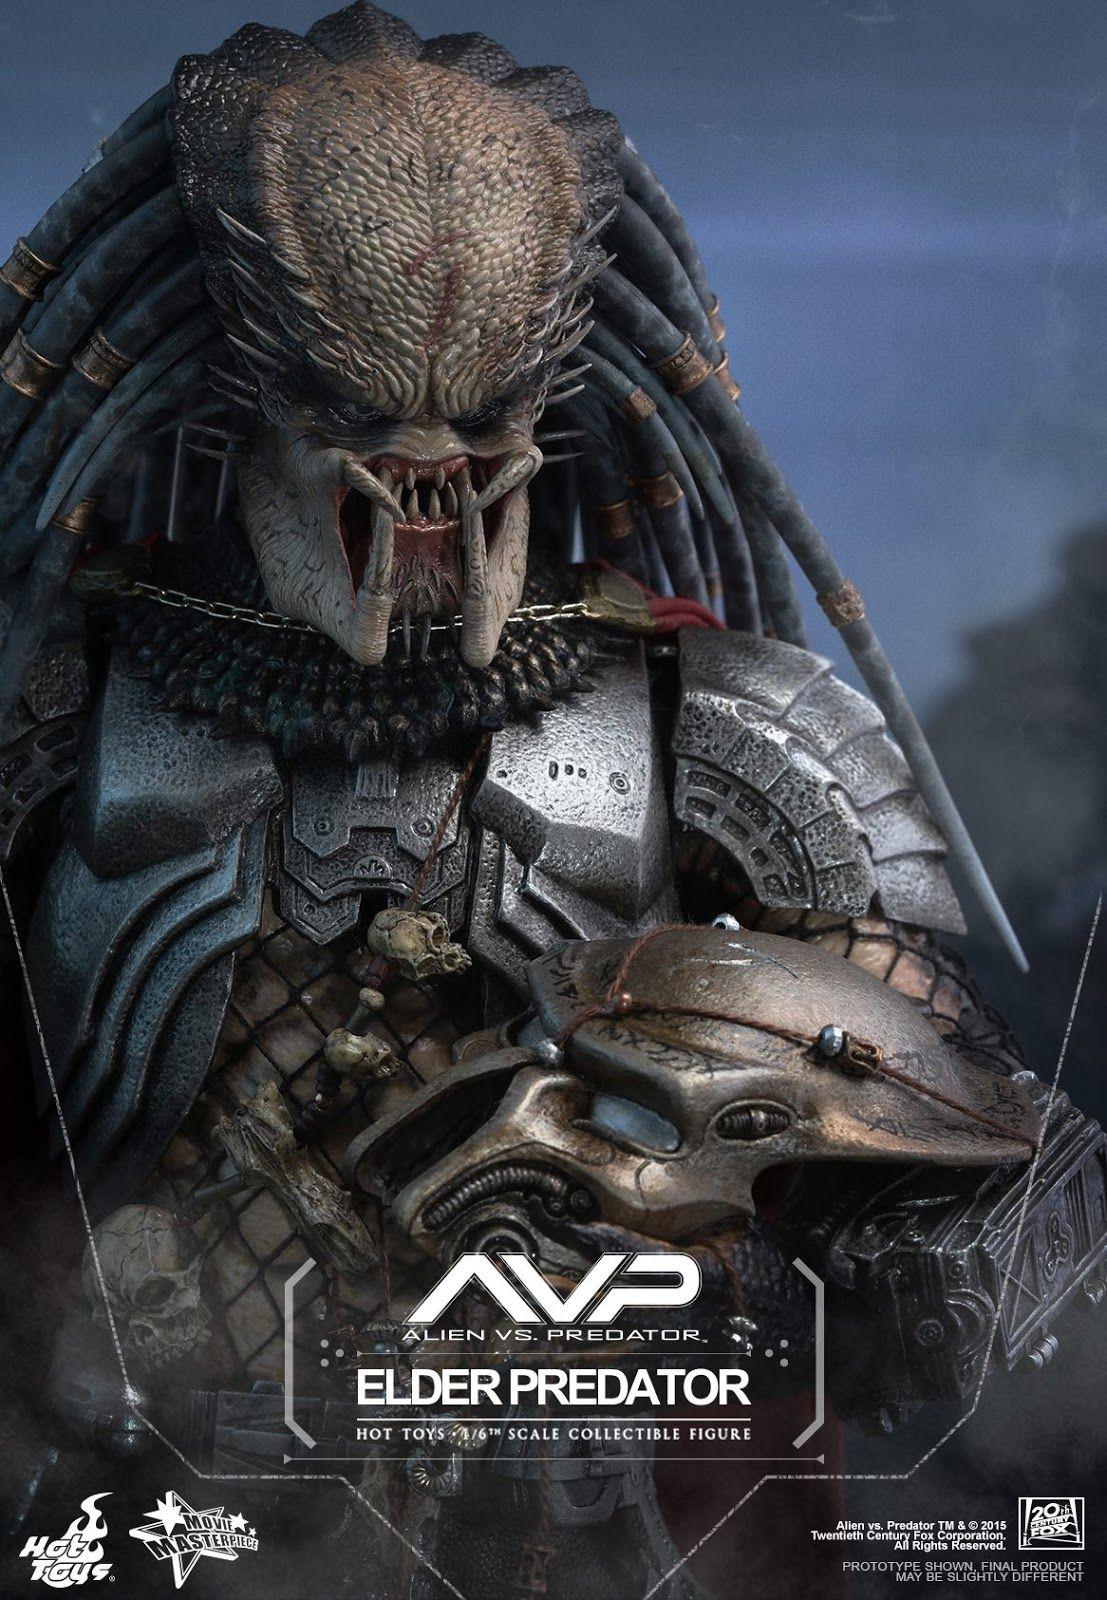 Preview Hot Toys Mms325 Avp Alien Vs Predator 1 6th Elder Predator Collectible Figure Predator Movie Alien Vs Predator Predator Alien